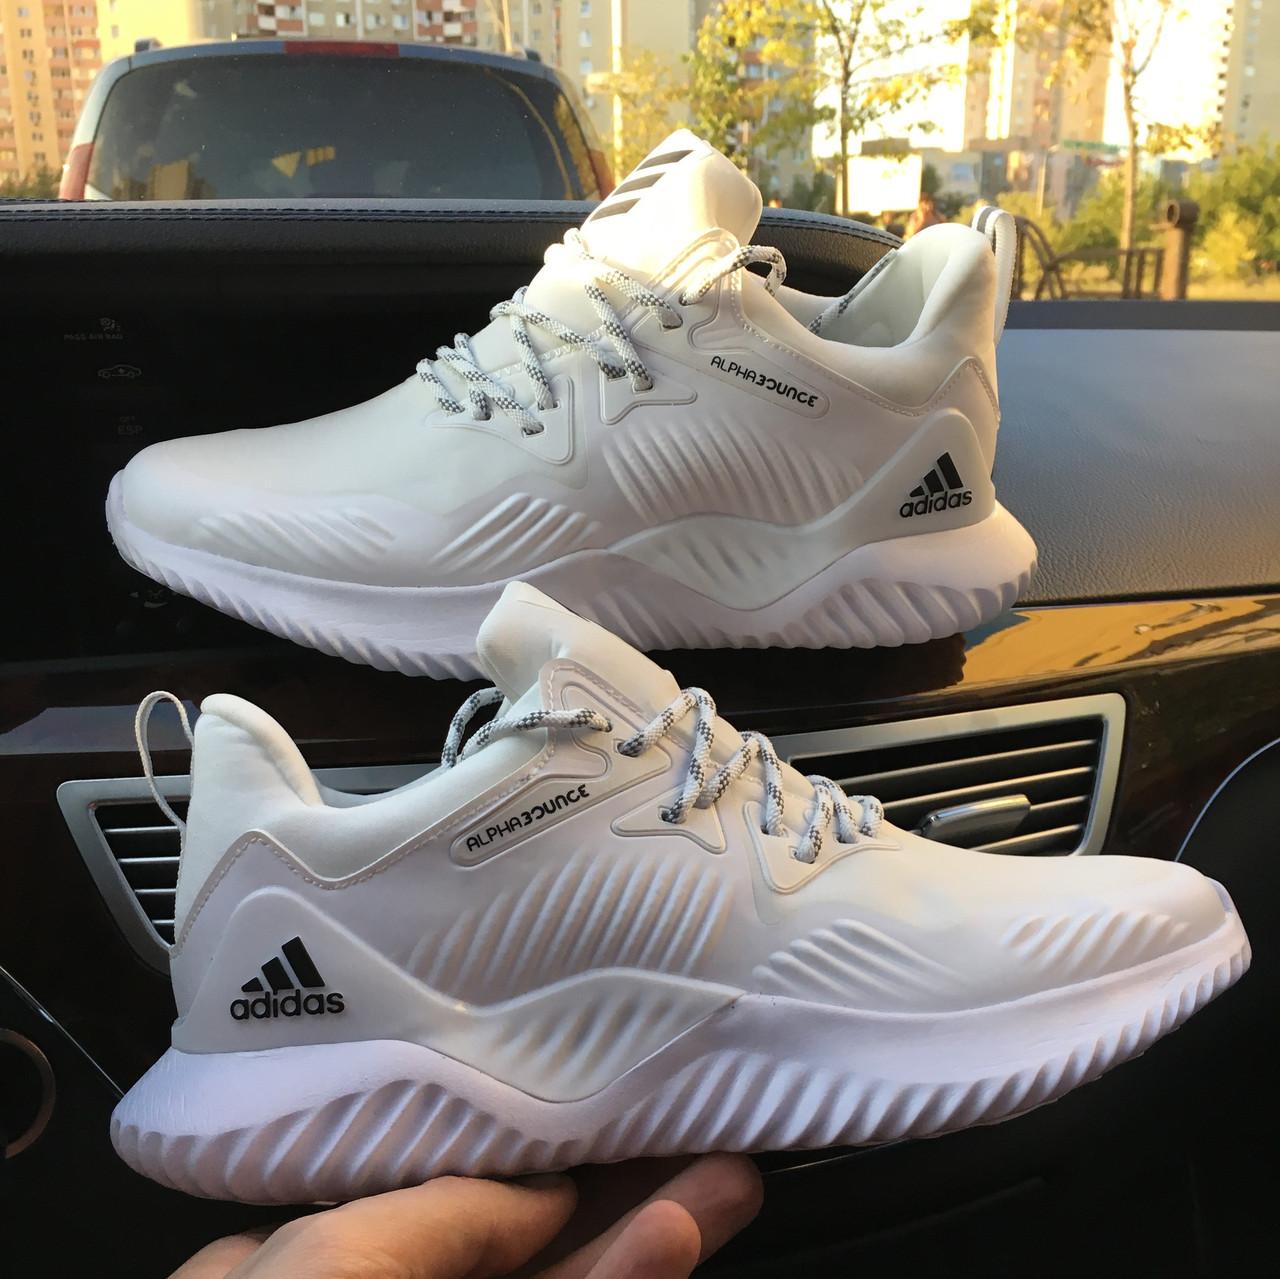 Мужские кроссовки Adidas Alphabounce Beyond M Elastic face white black, Реплика